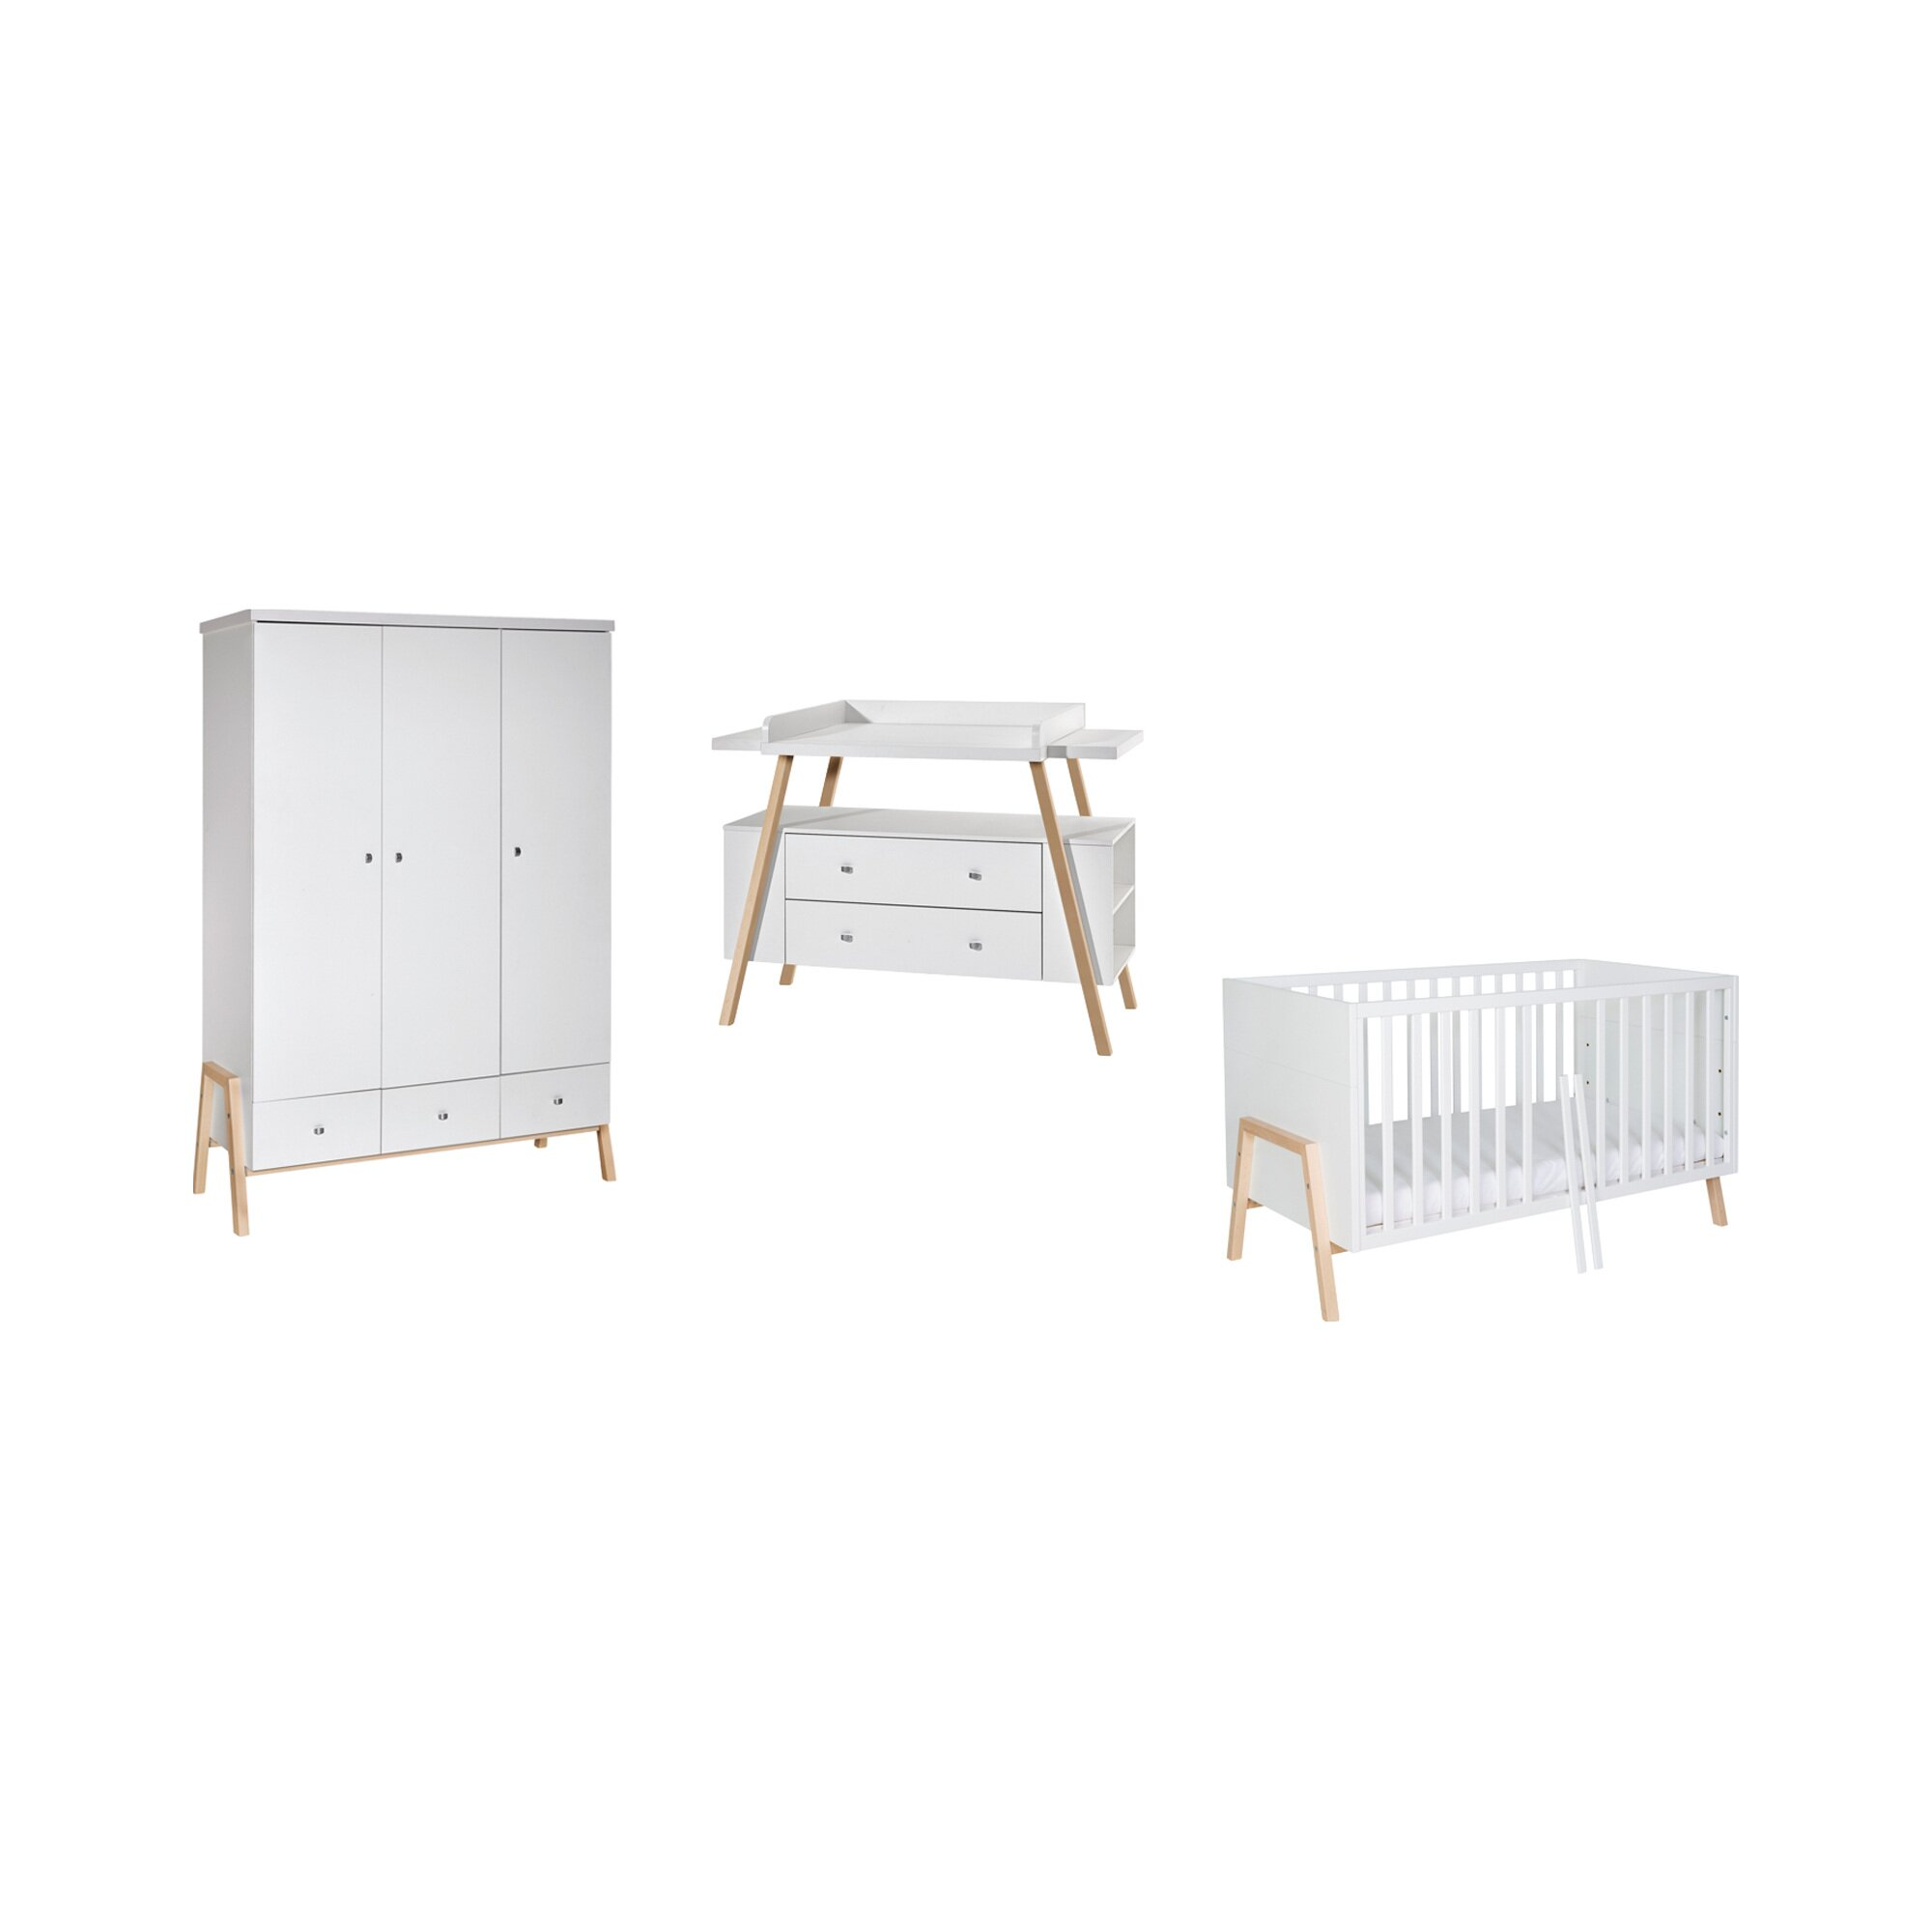 schardt-3-tlg-babyzimmer-holly-nature